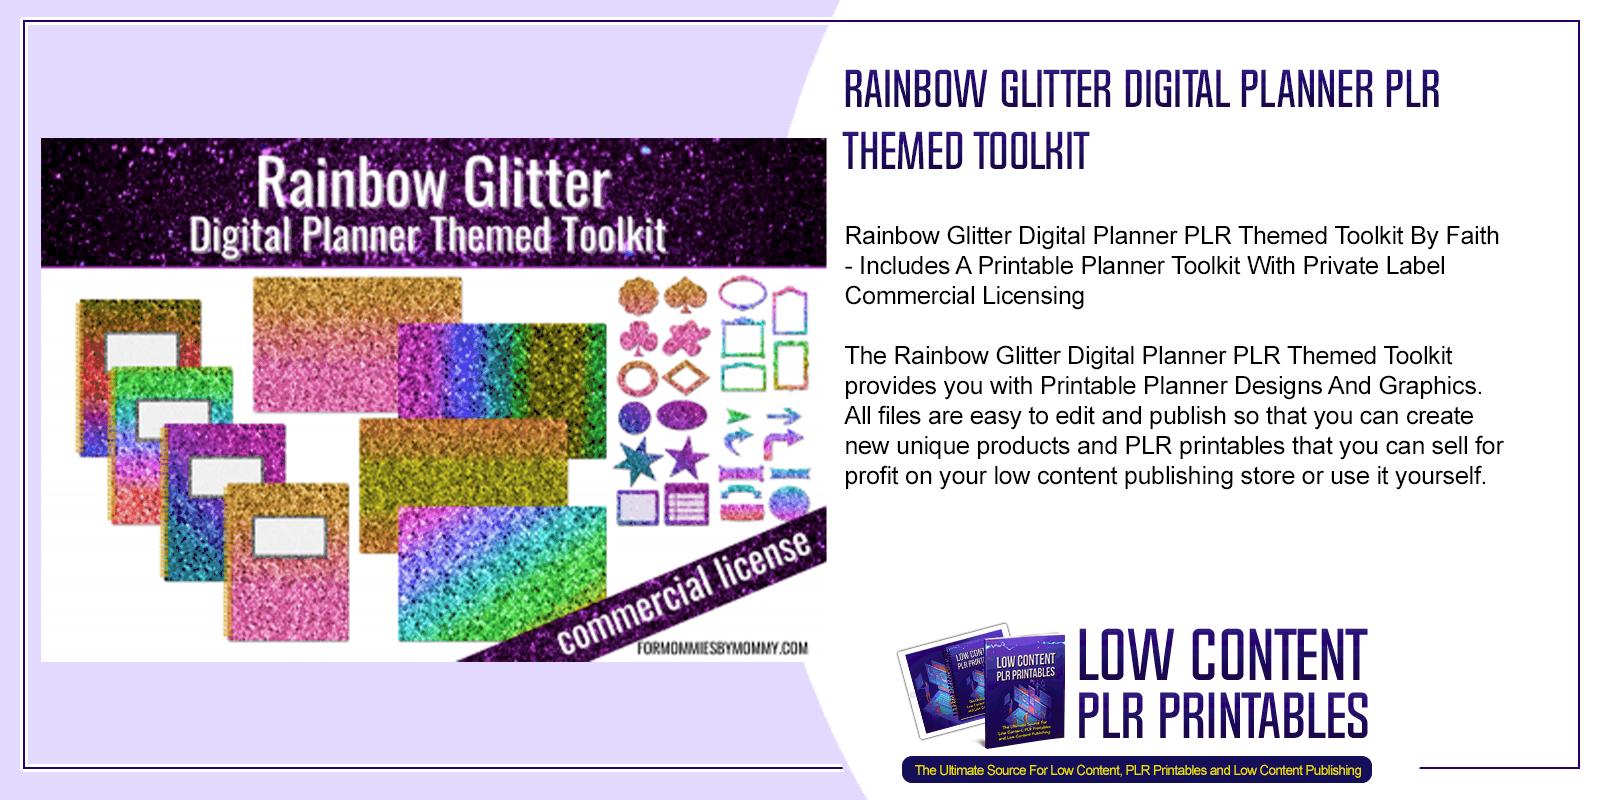 Rainbow Glitter Digital Planner PLR Themed Toolkit